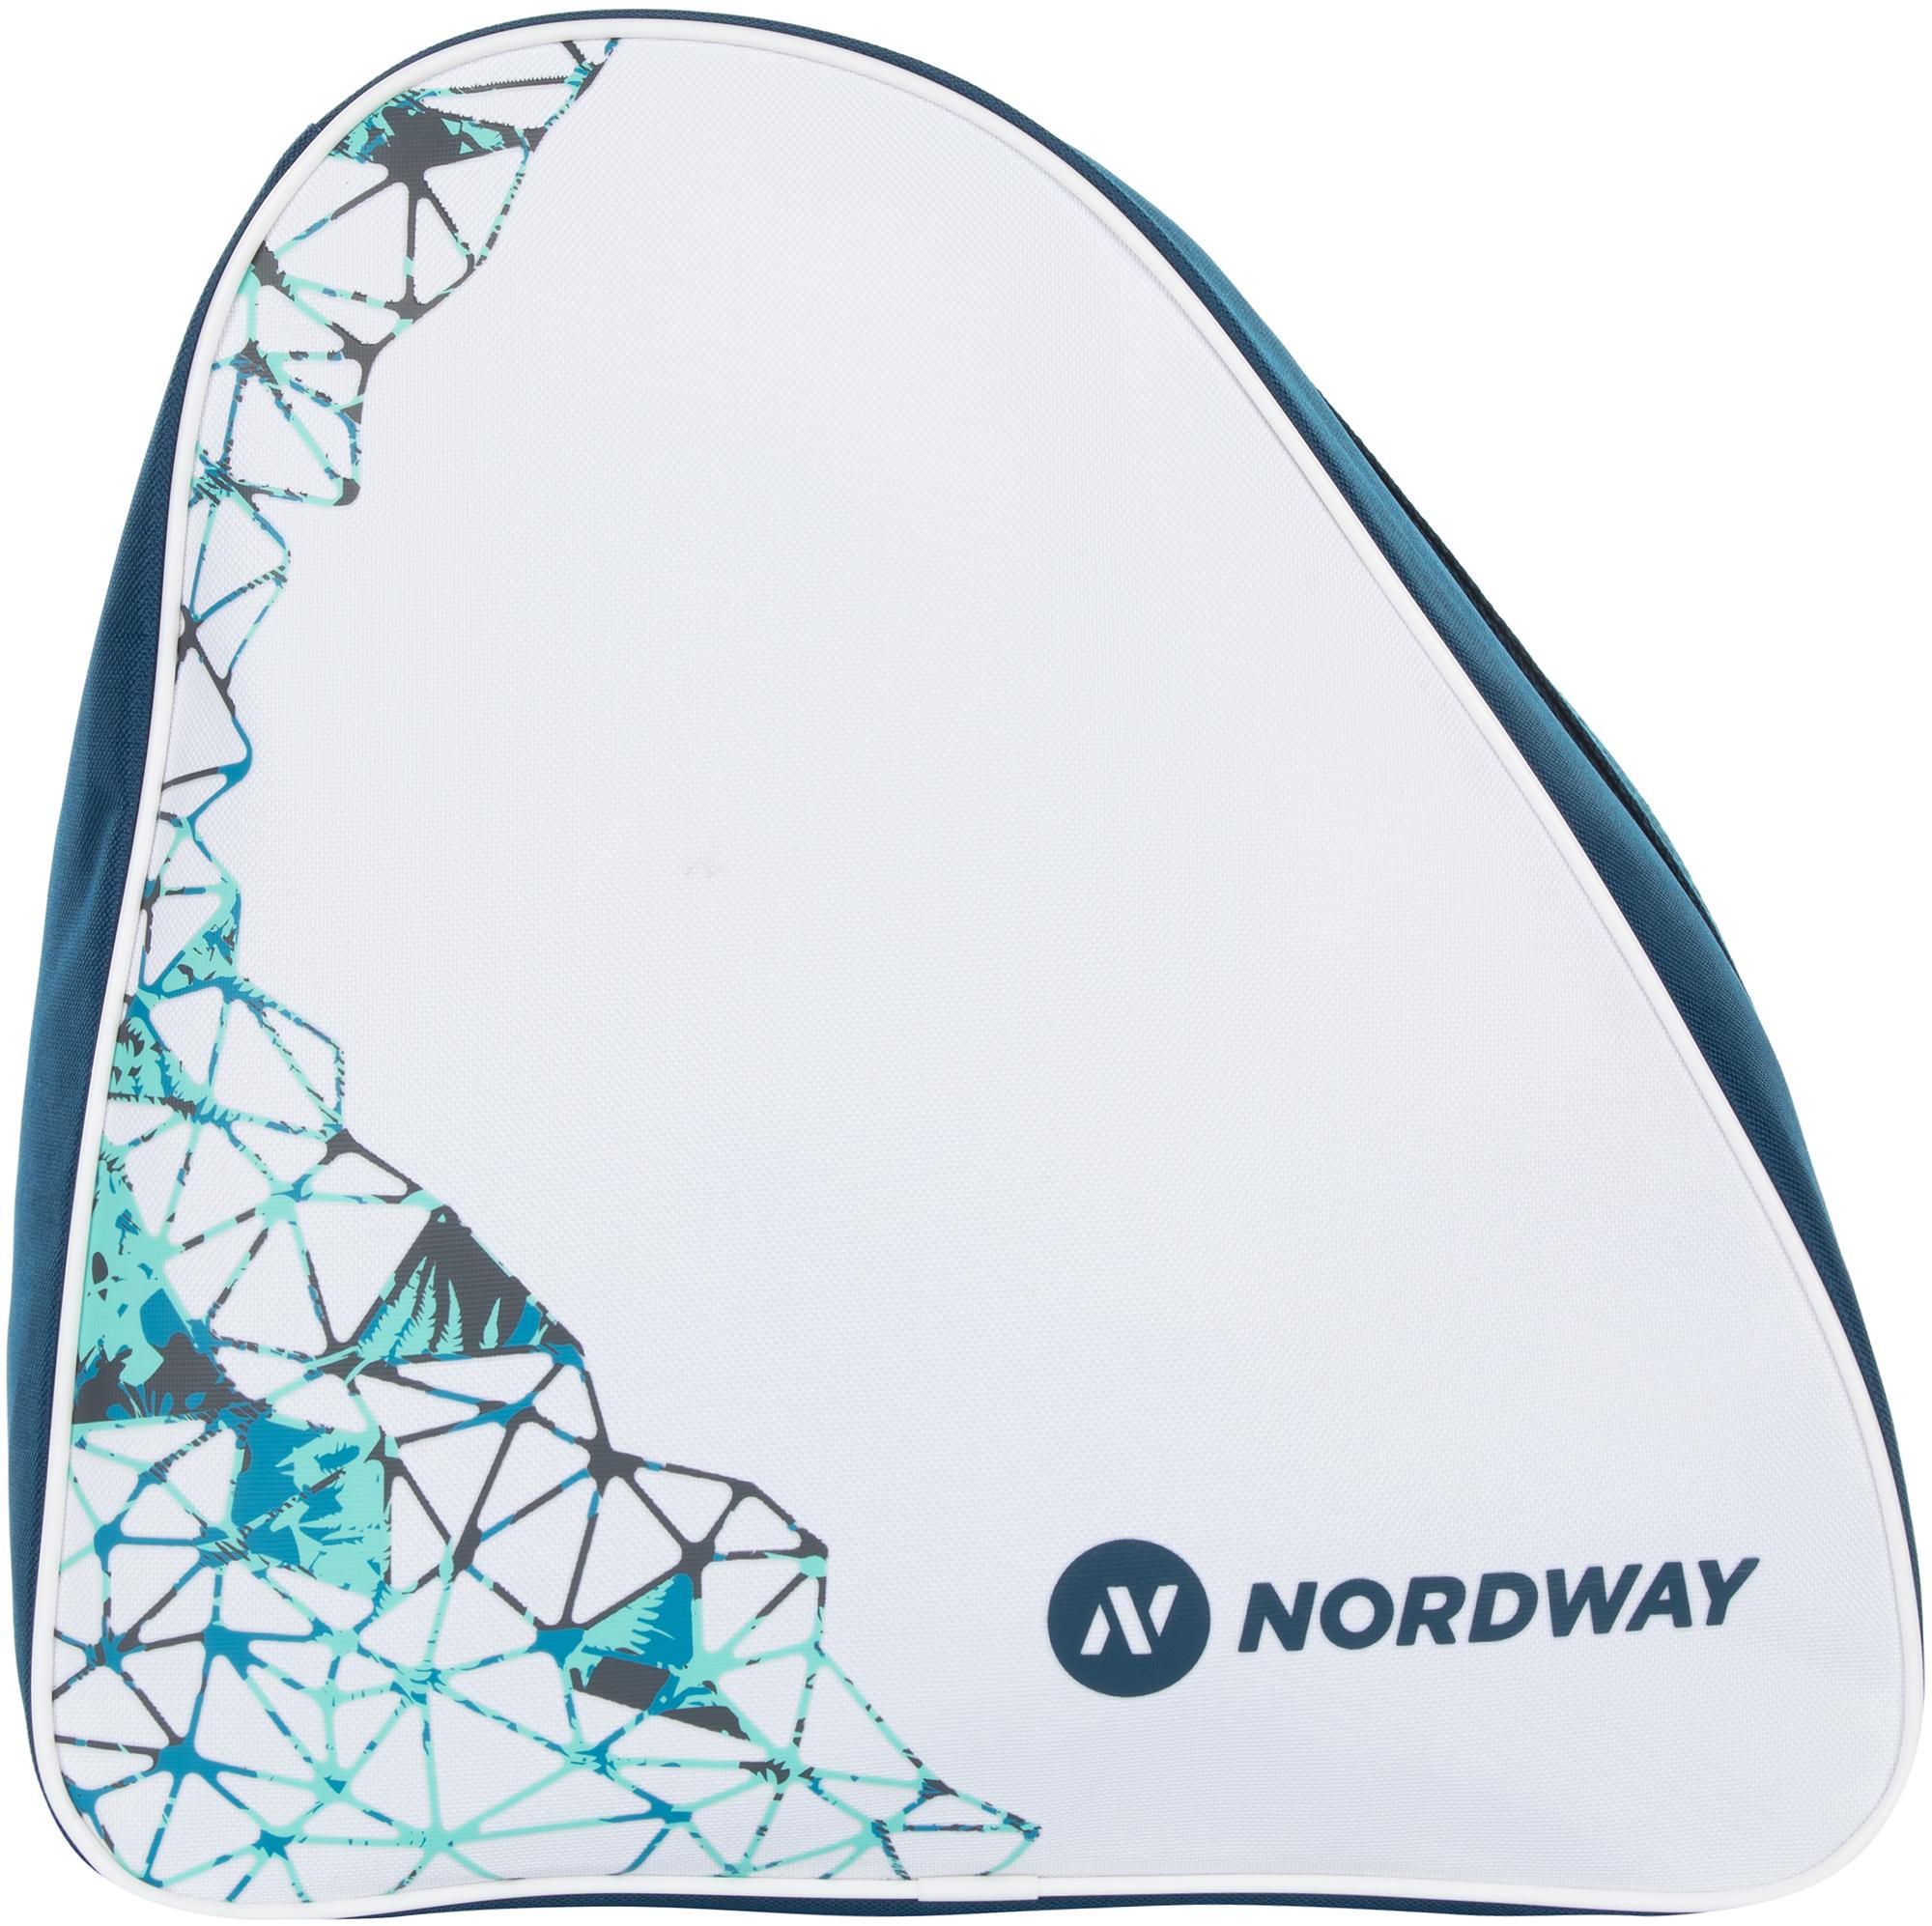 Nordway Сумка для ледовых коньков Nordway ADELE nordway nordway adele взрослые размер 41